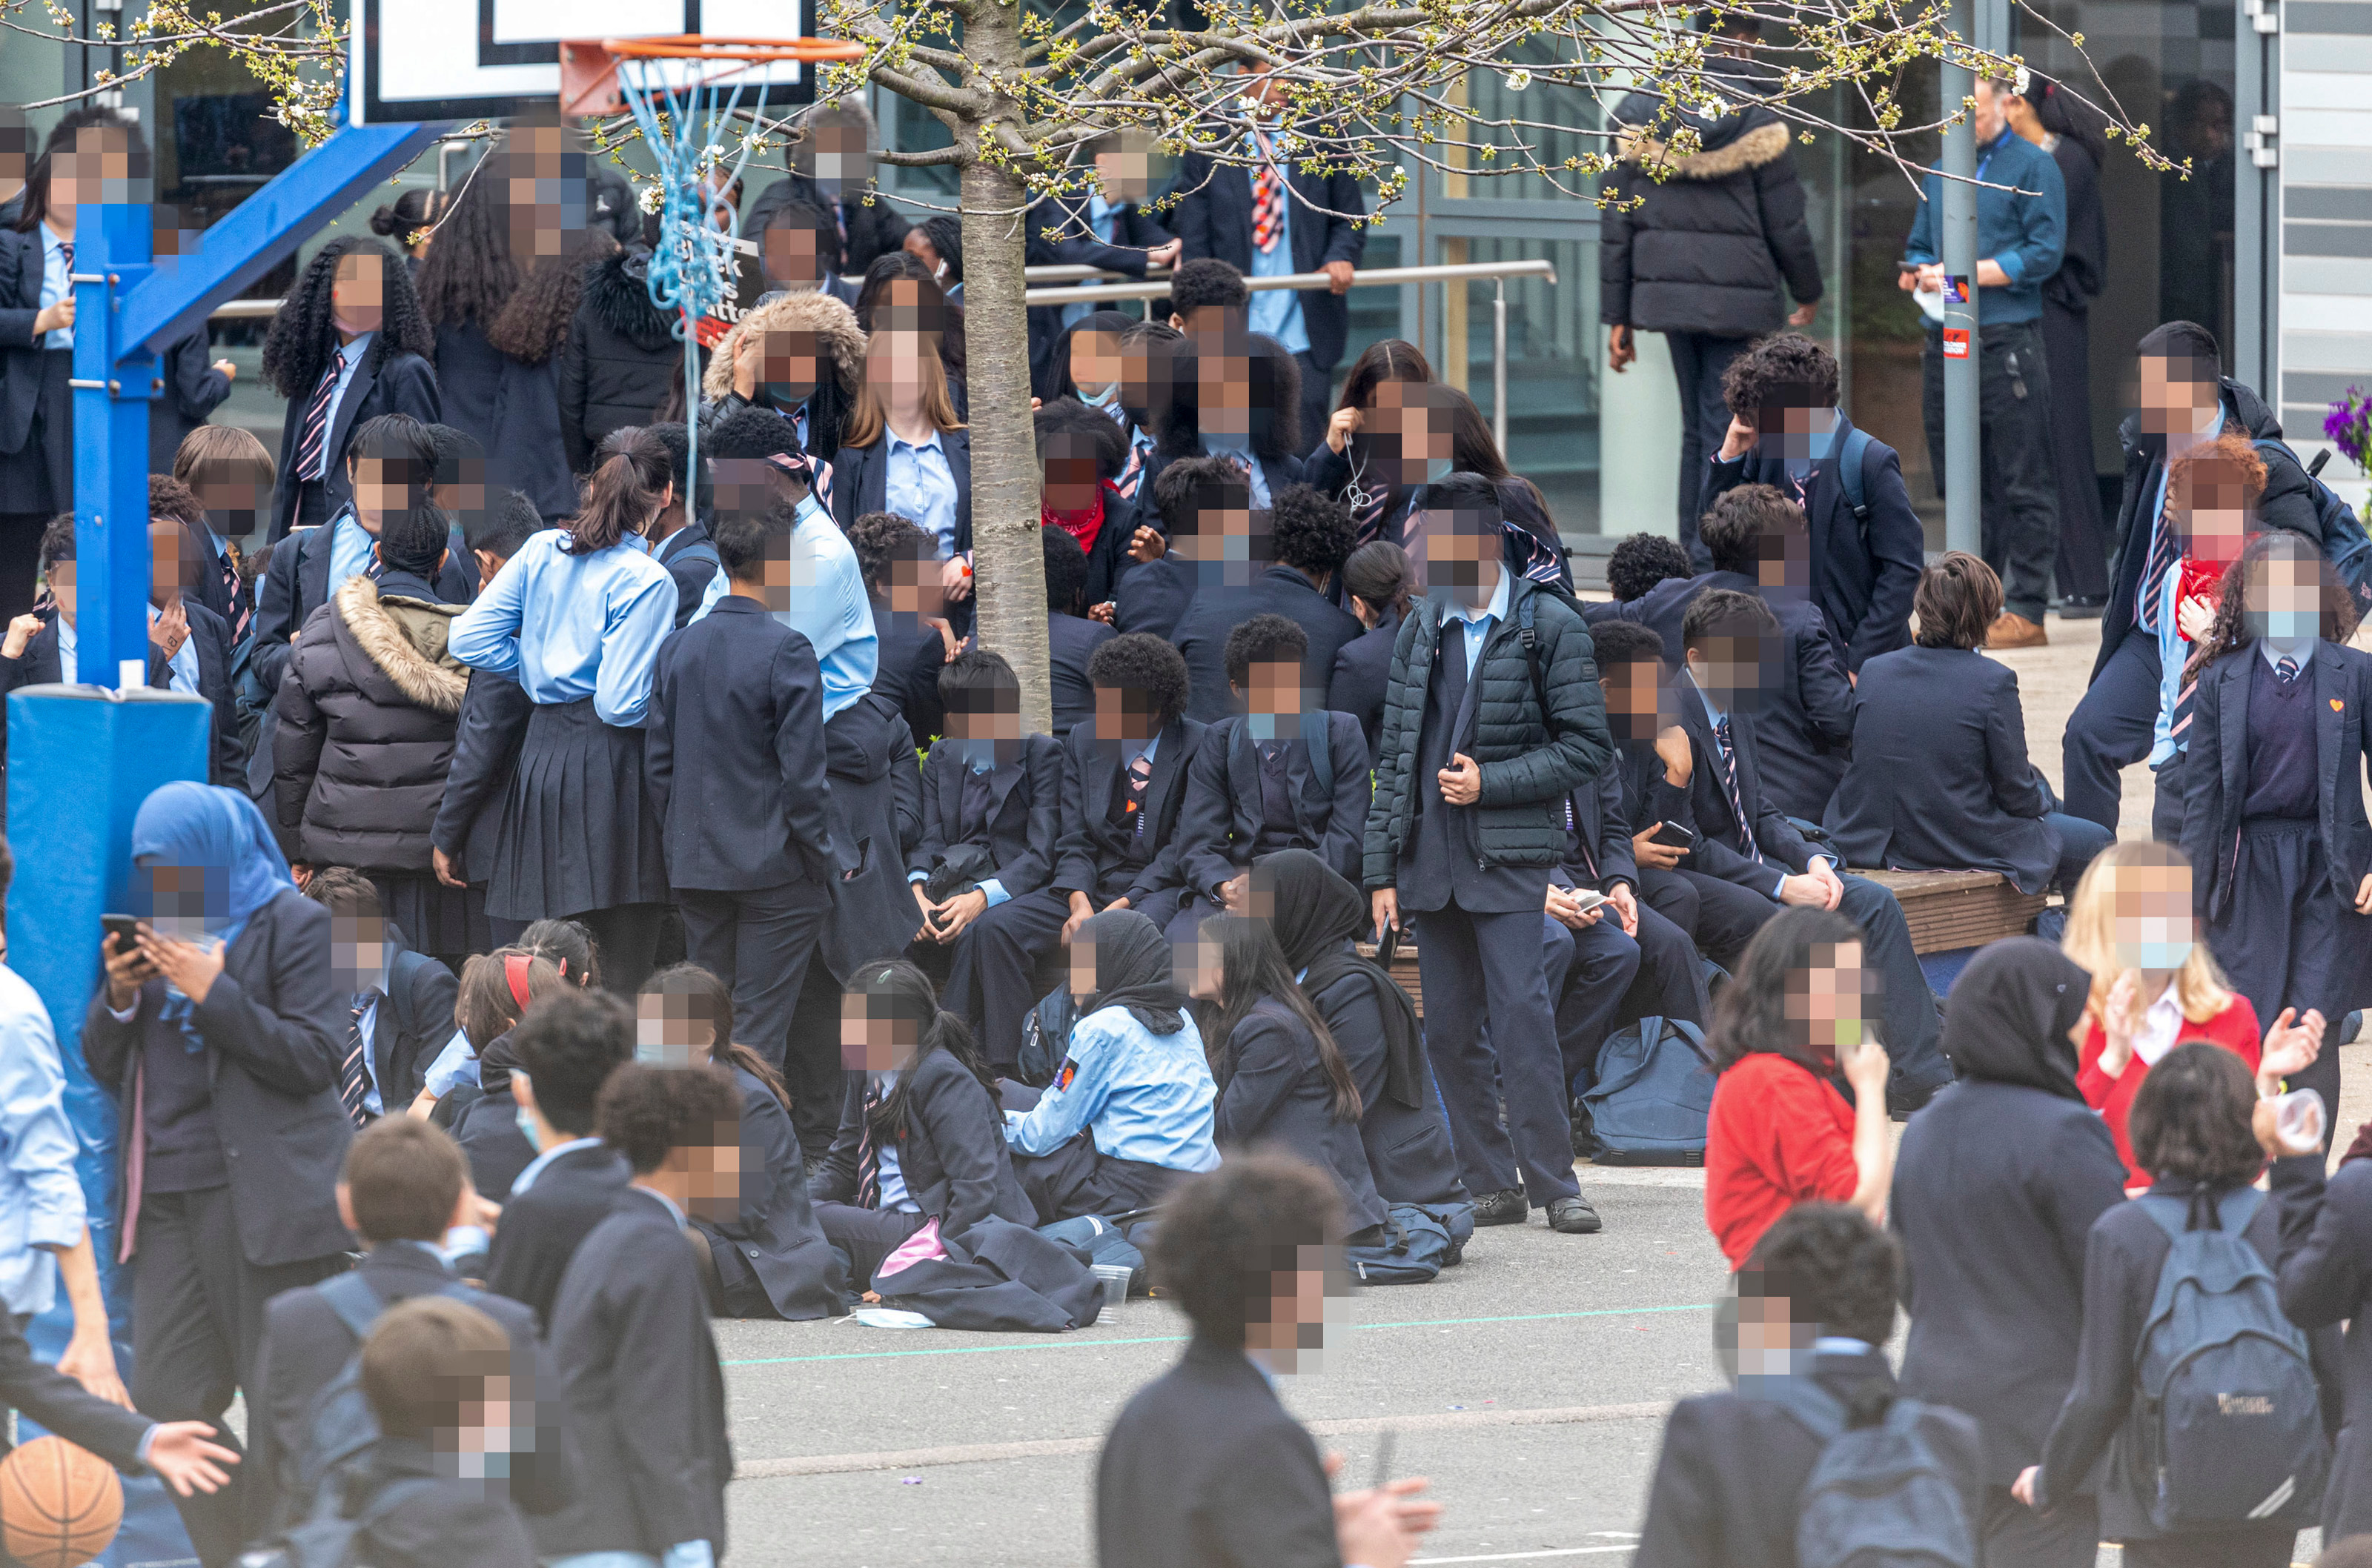 LNP School Demo ALE 02111 School demo in playground of Pimlico Academy Londonjpg JS644733218